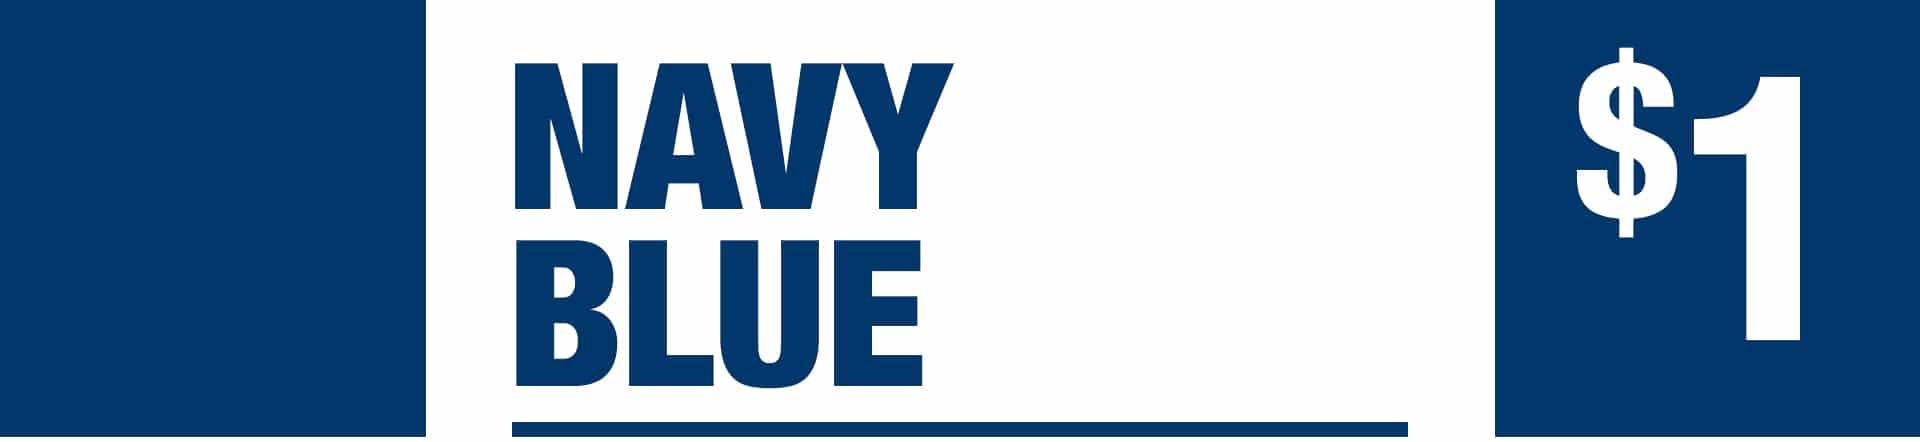 Navy Blue - One Dollar Jackpot